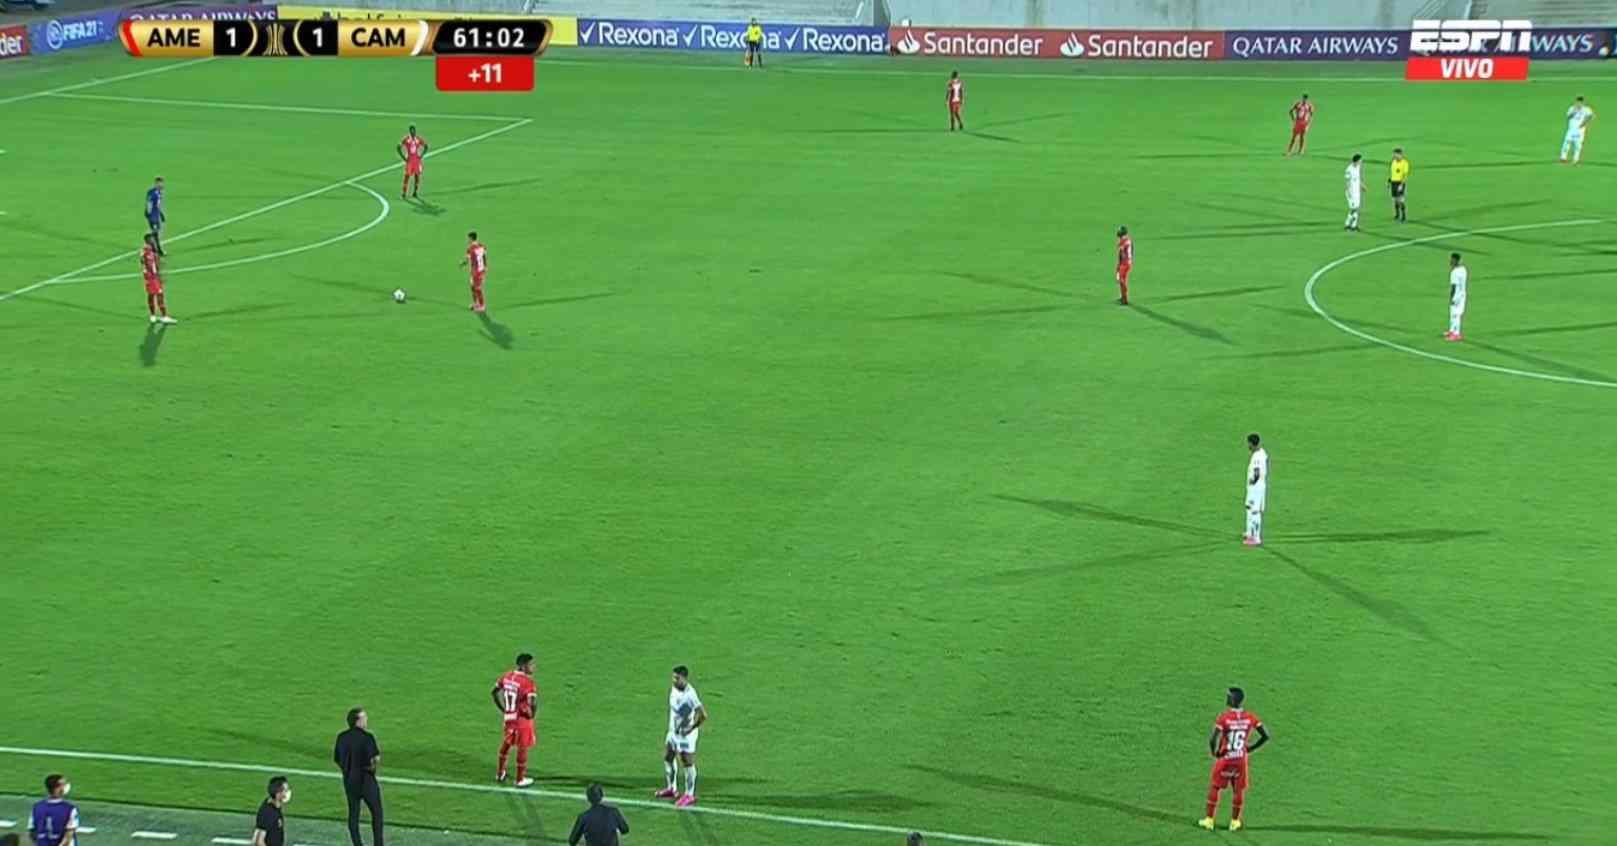 ¡Papelón! Jugadores de América y Atlético Mineiro se revelaron